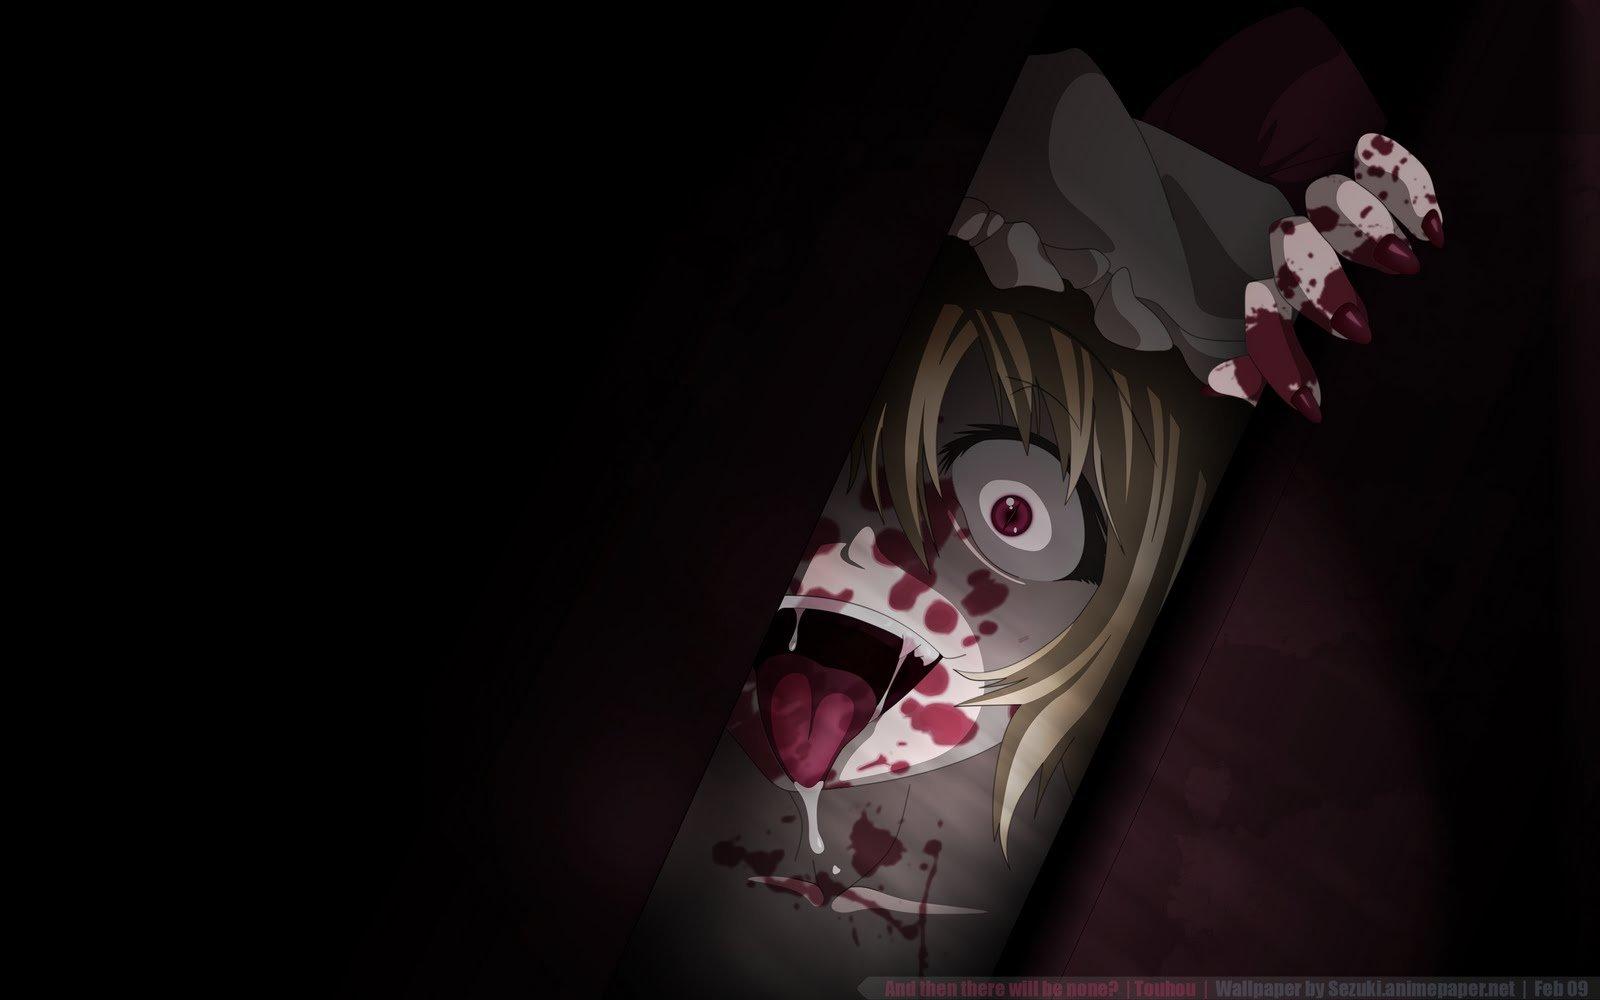 10+] Creepy Anime Wallpaper on WallpaperSafari